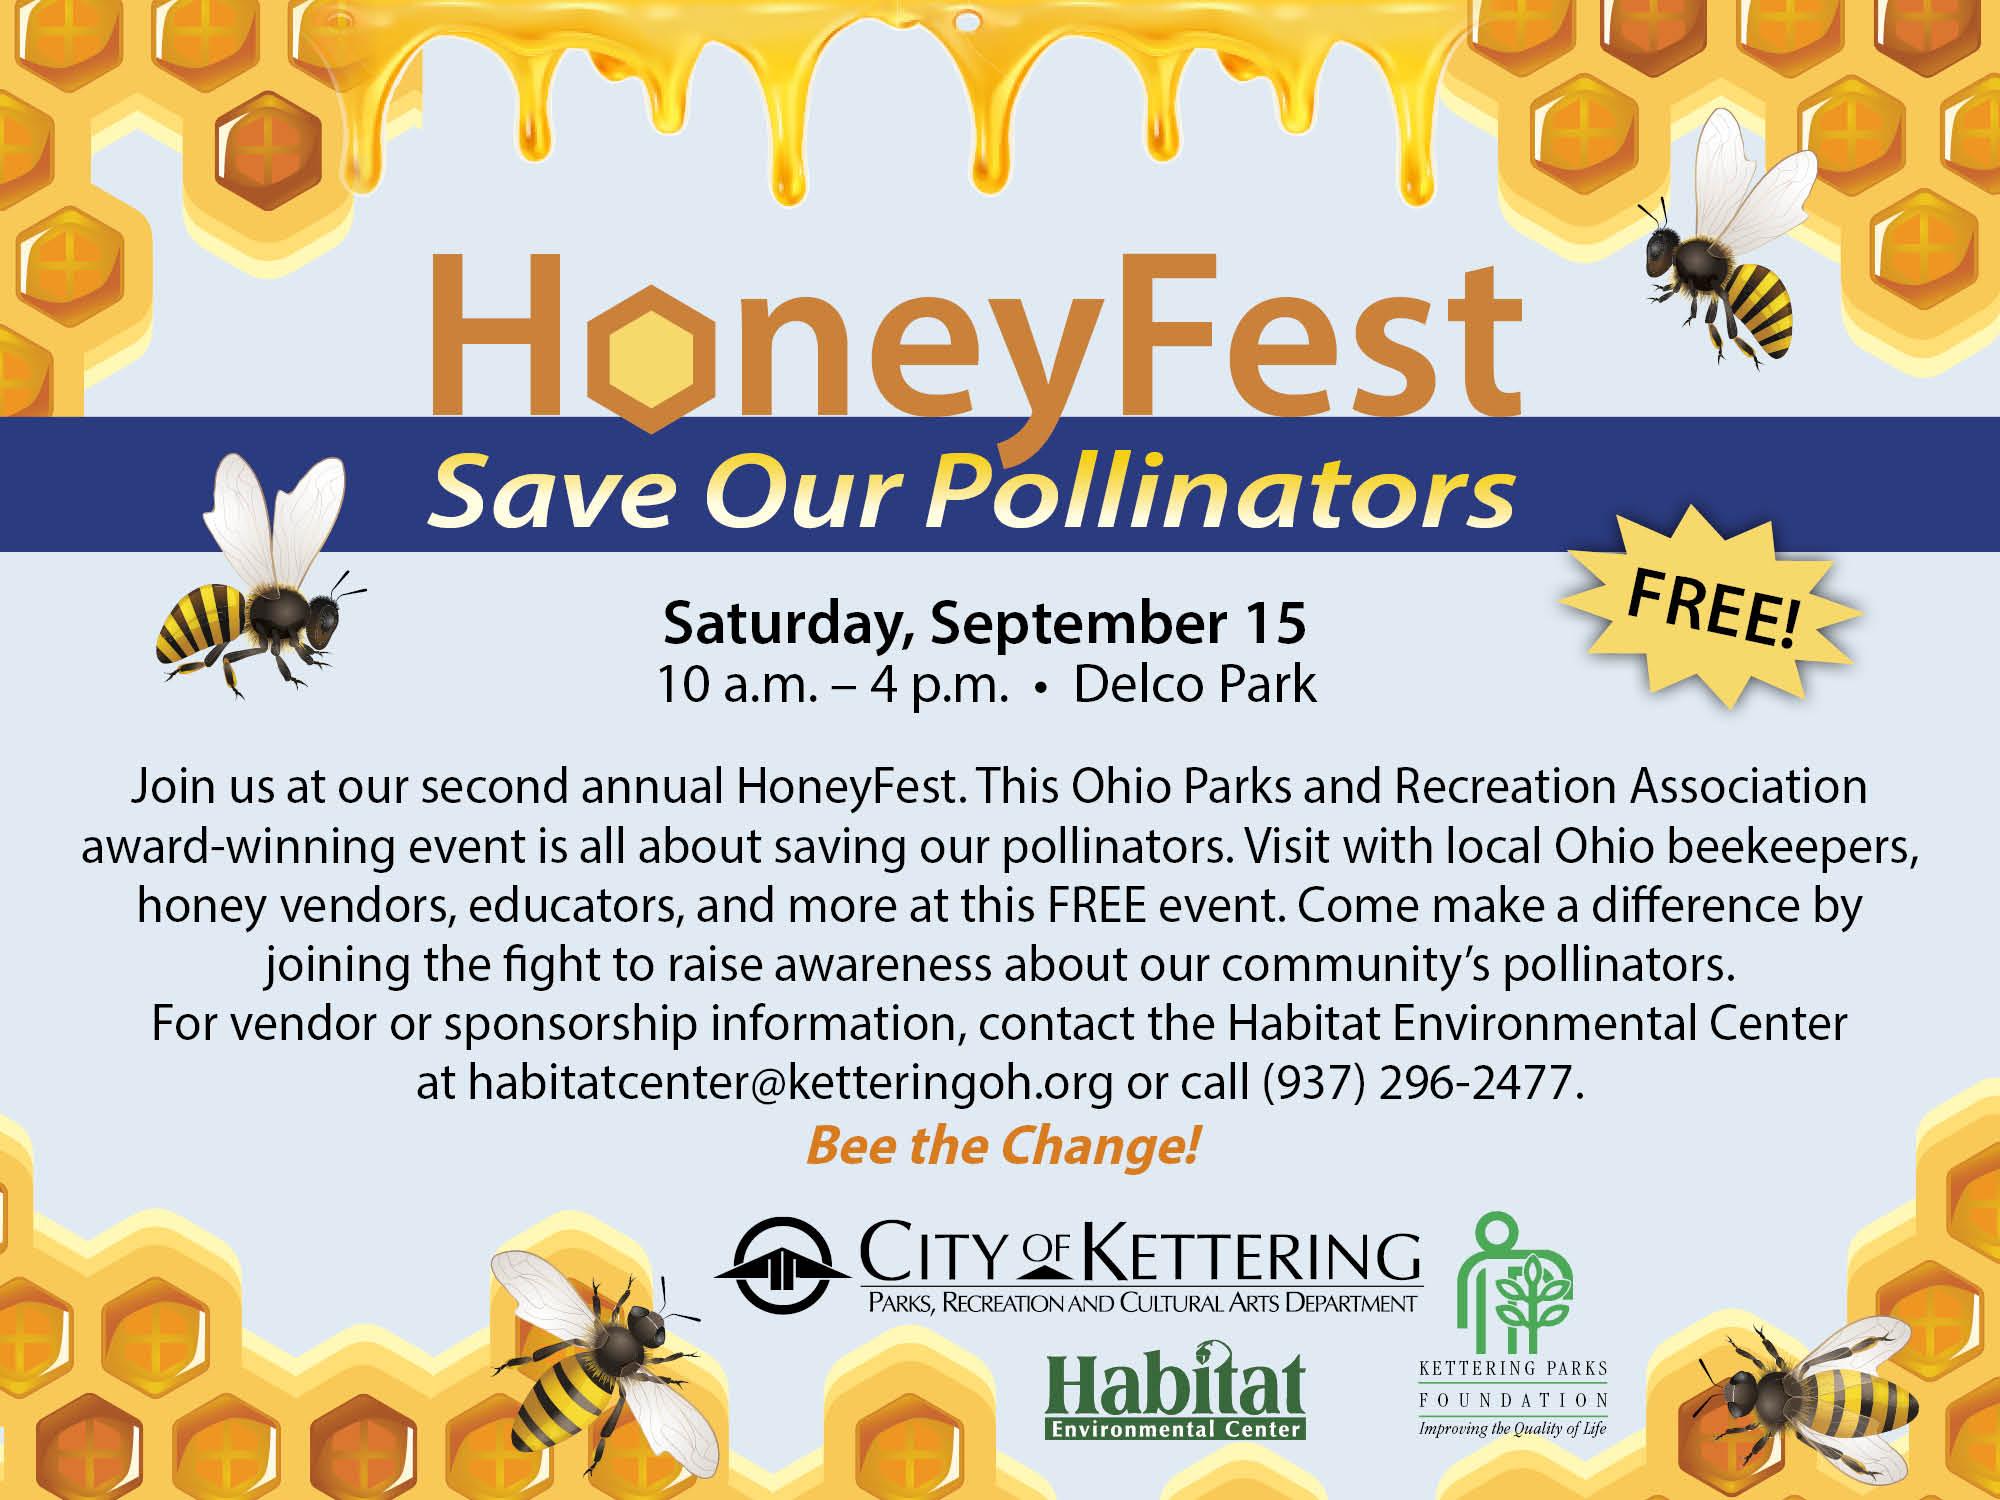 honeyfest graphic 2018